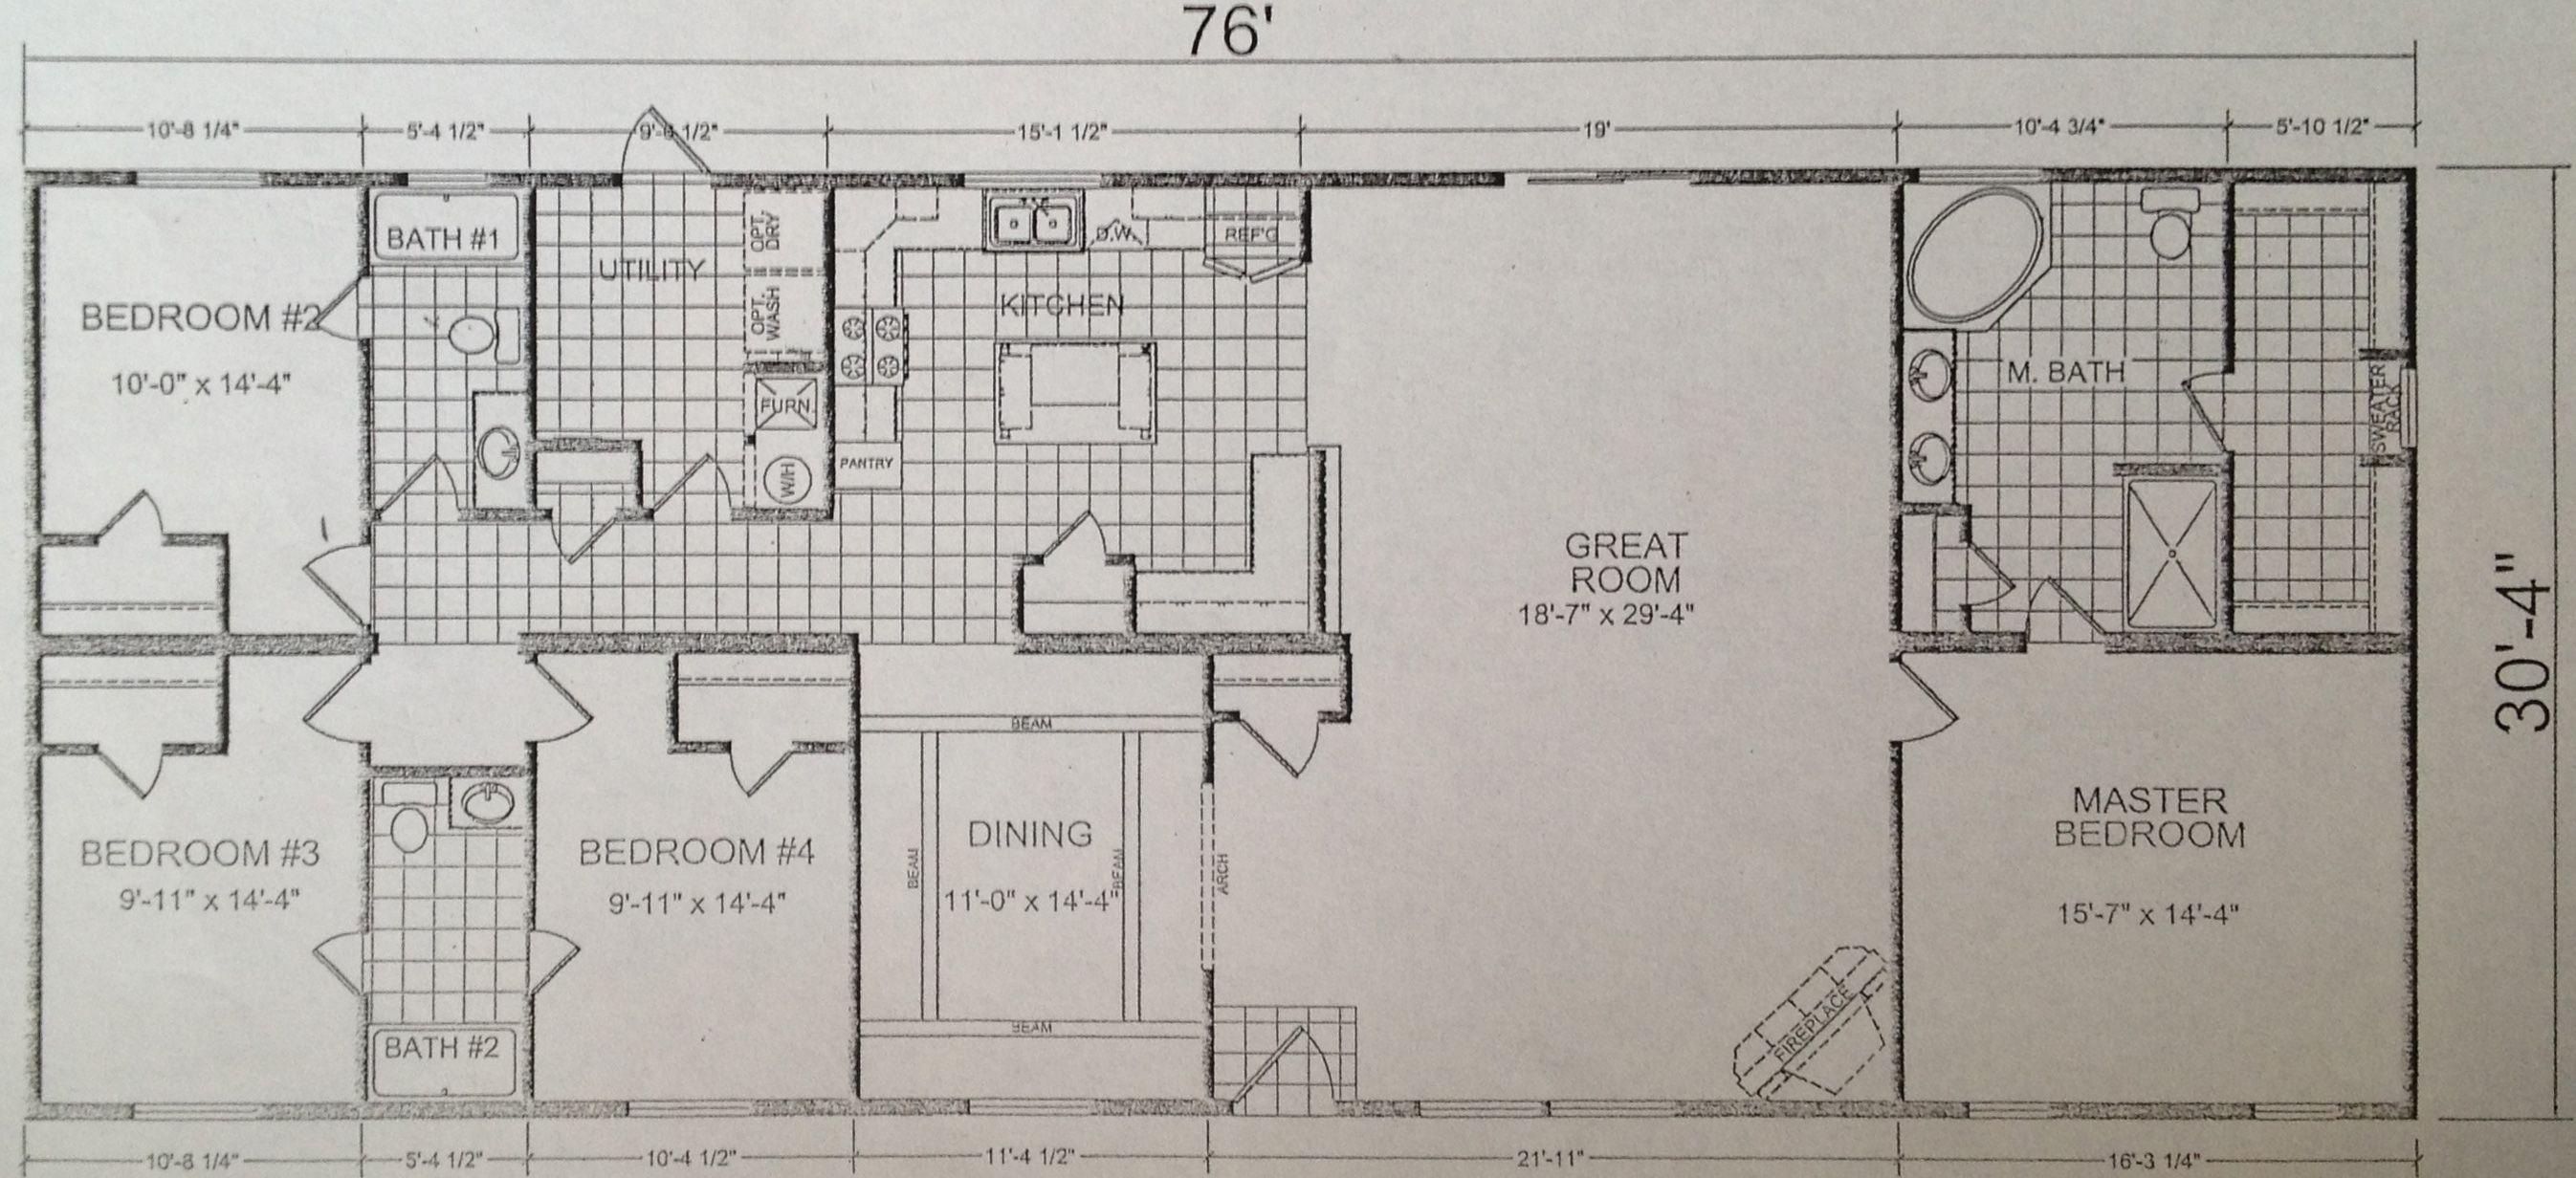 Triple Wide Mobile Home Floor Plans   Model 249 - Calvin Klein Homes on spartan mobile homes, mossy oak mobile homes, skyline mobile homes, southern energy mobile homes, daystar mobile homes,